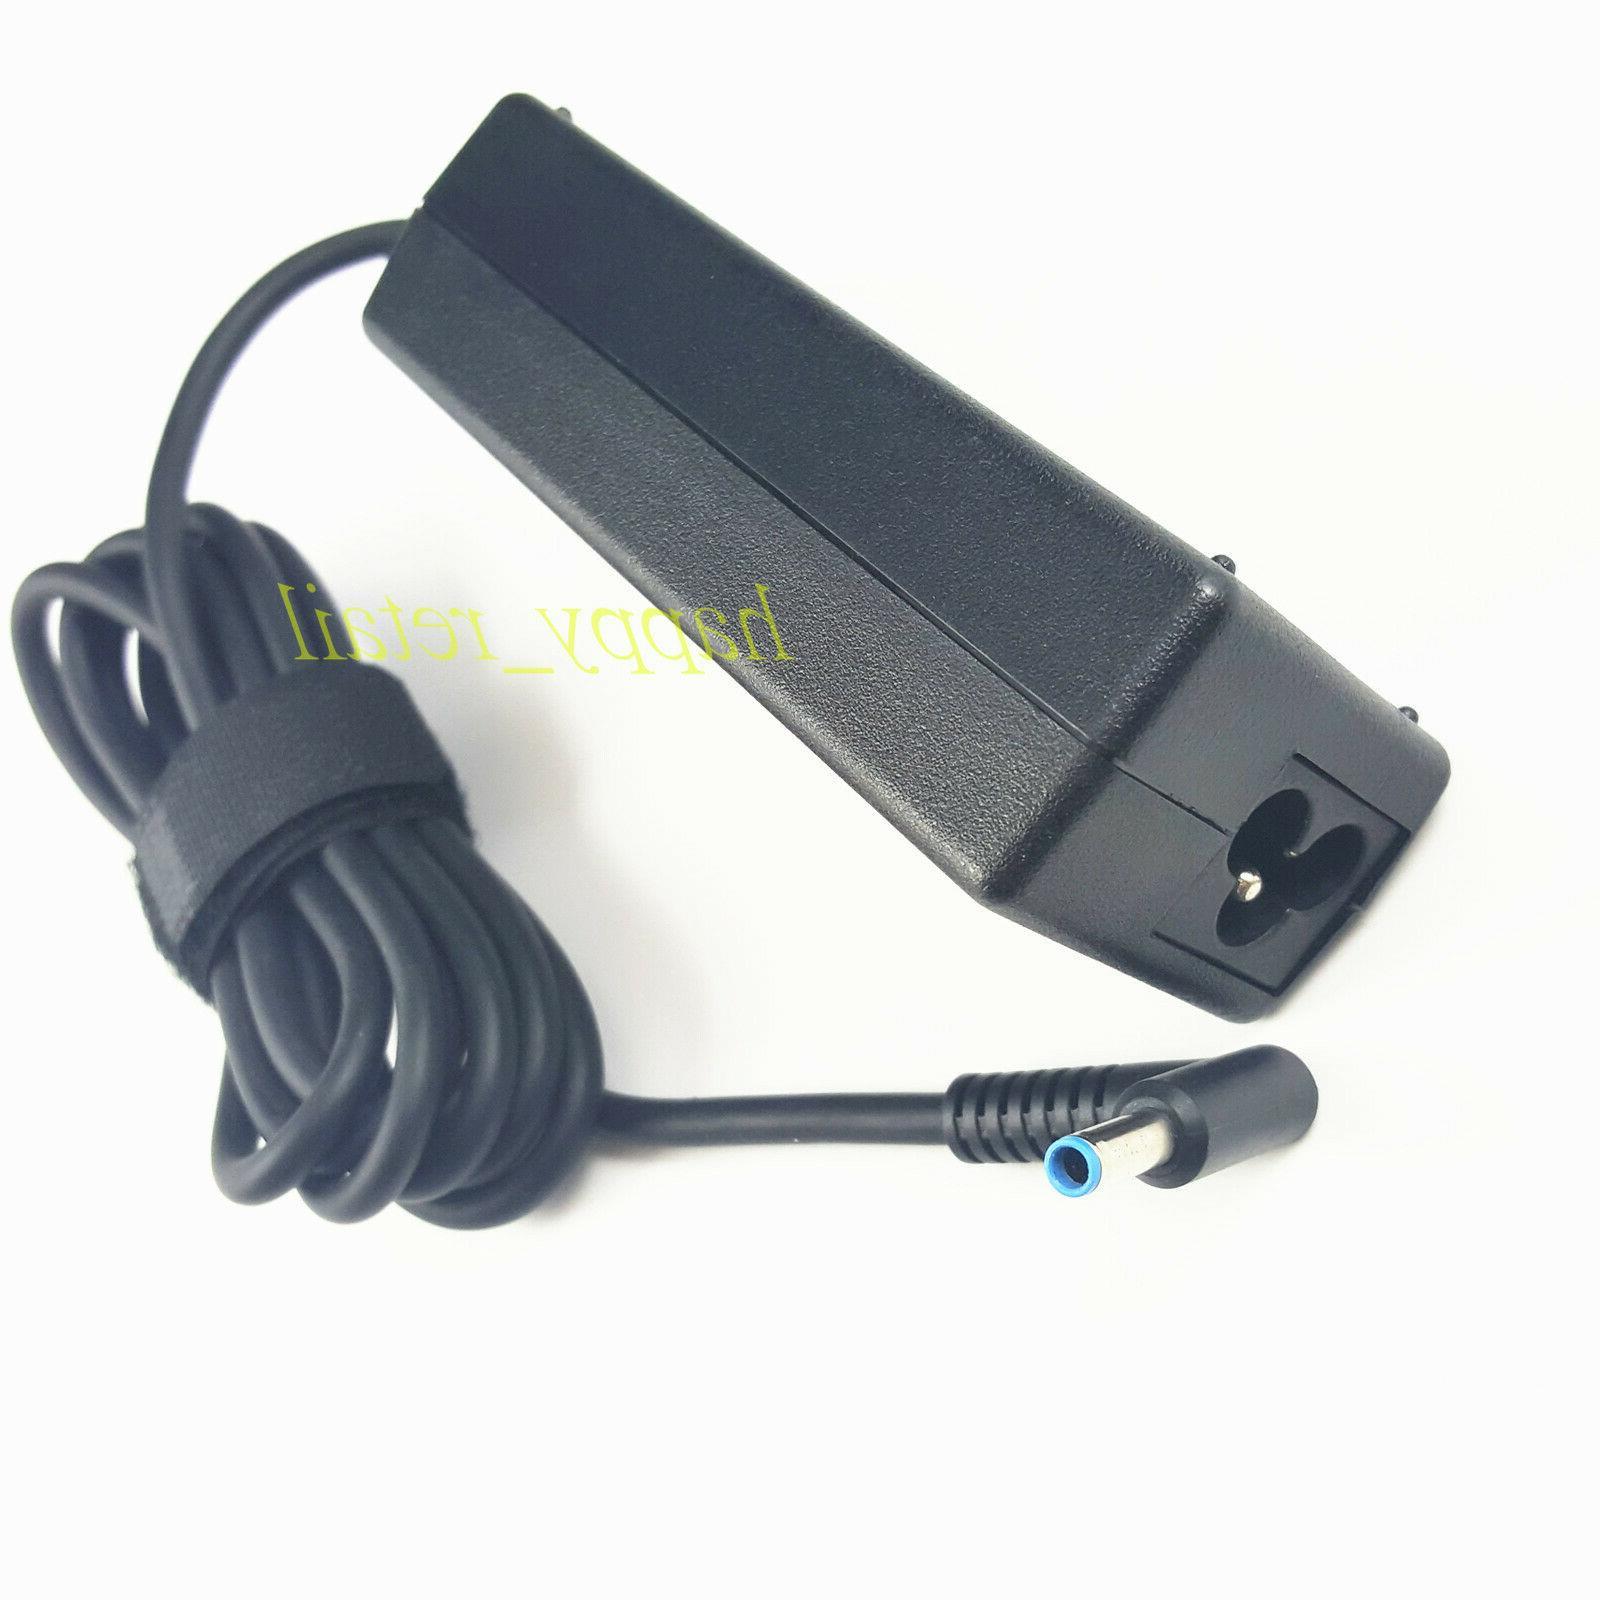 OEM 45W 19.5V 2.31A Laptop Power Supply